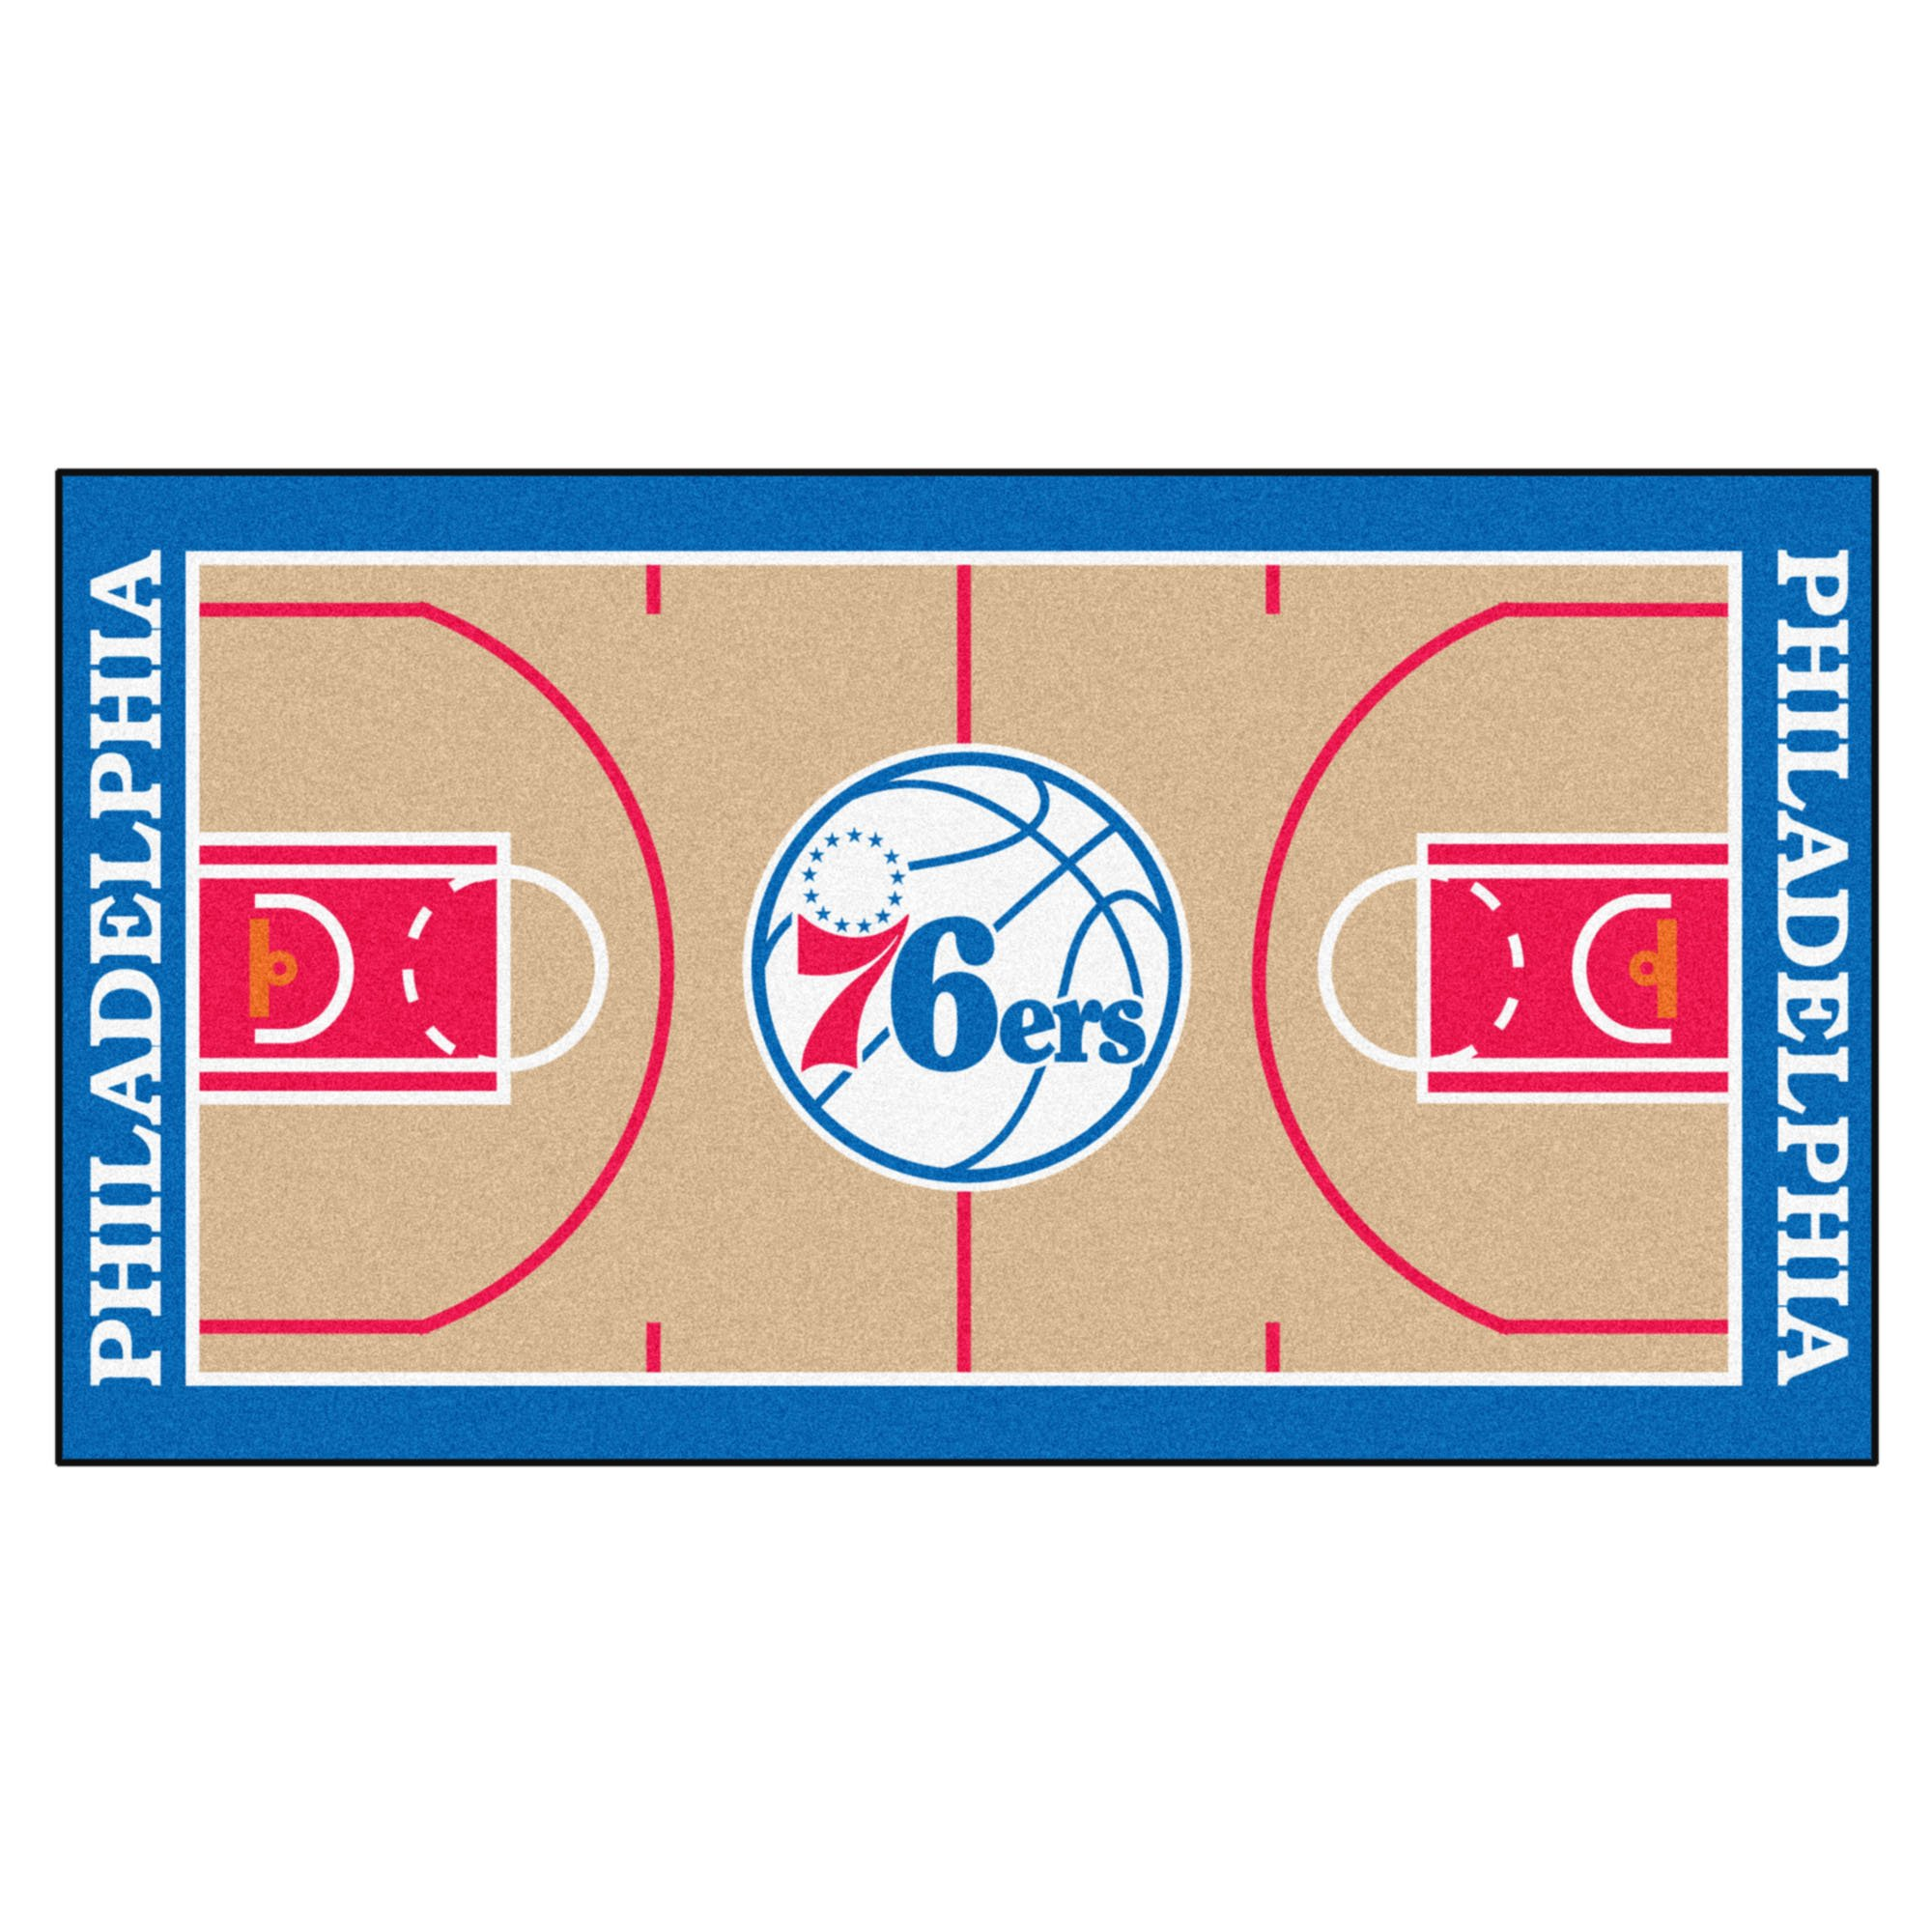 FANMATS NBA Philadelphia 76ers Nylon Face NBA Court Runner-Small by Fanmats